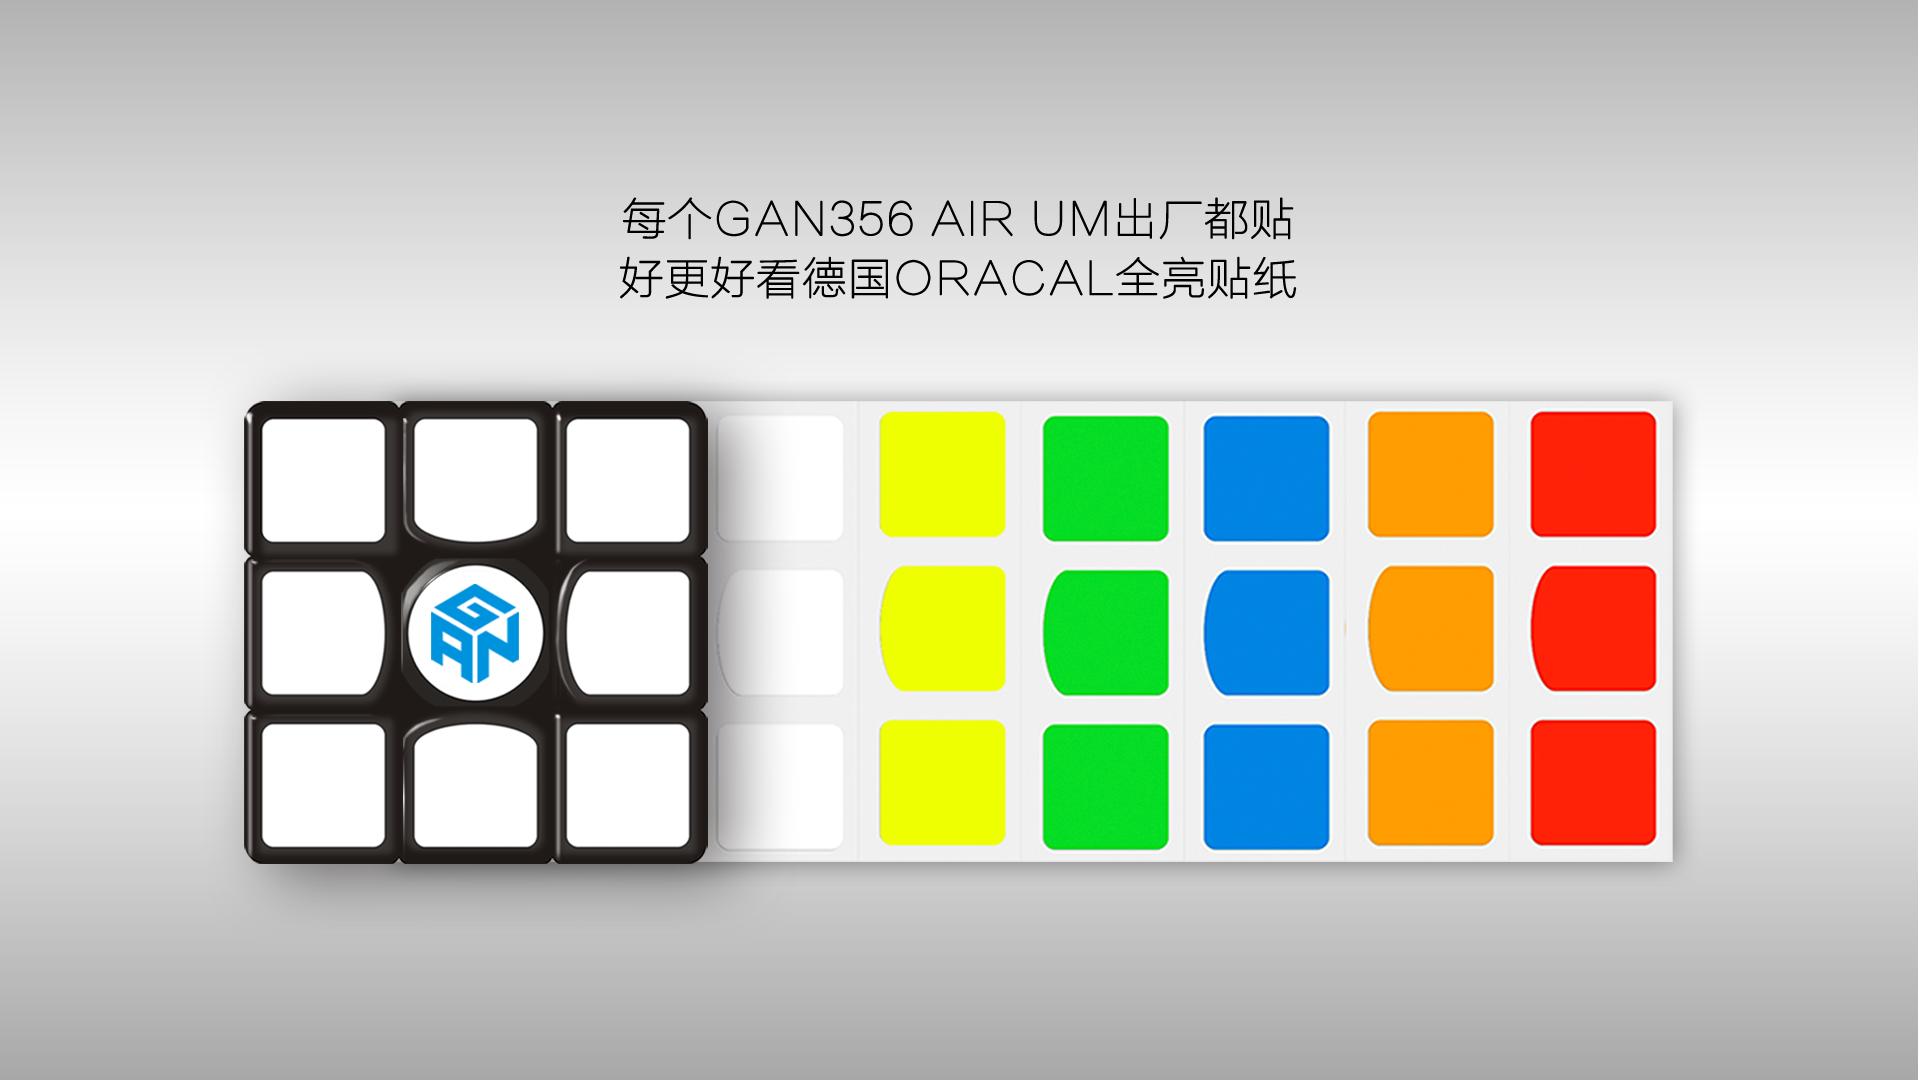 17-01-19Air-UM-CN_02